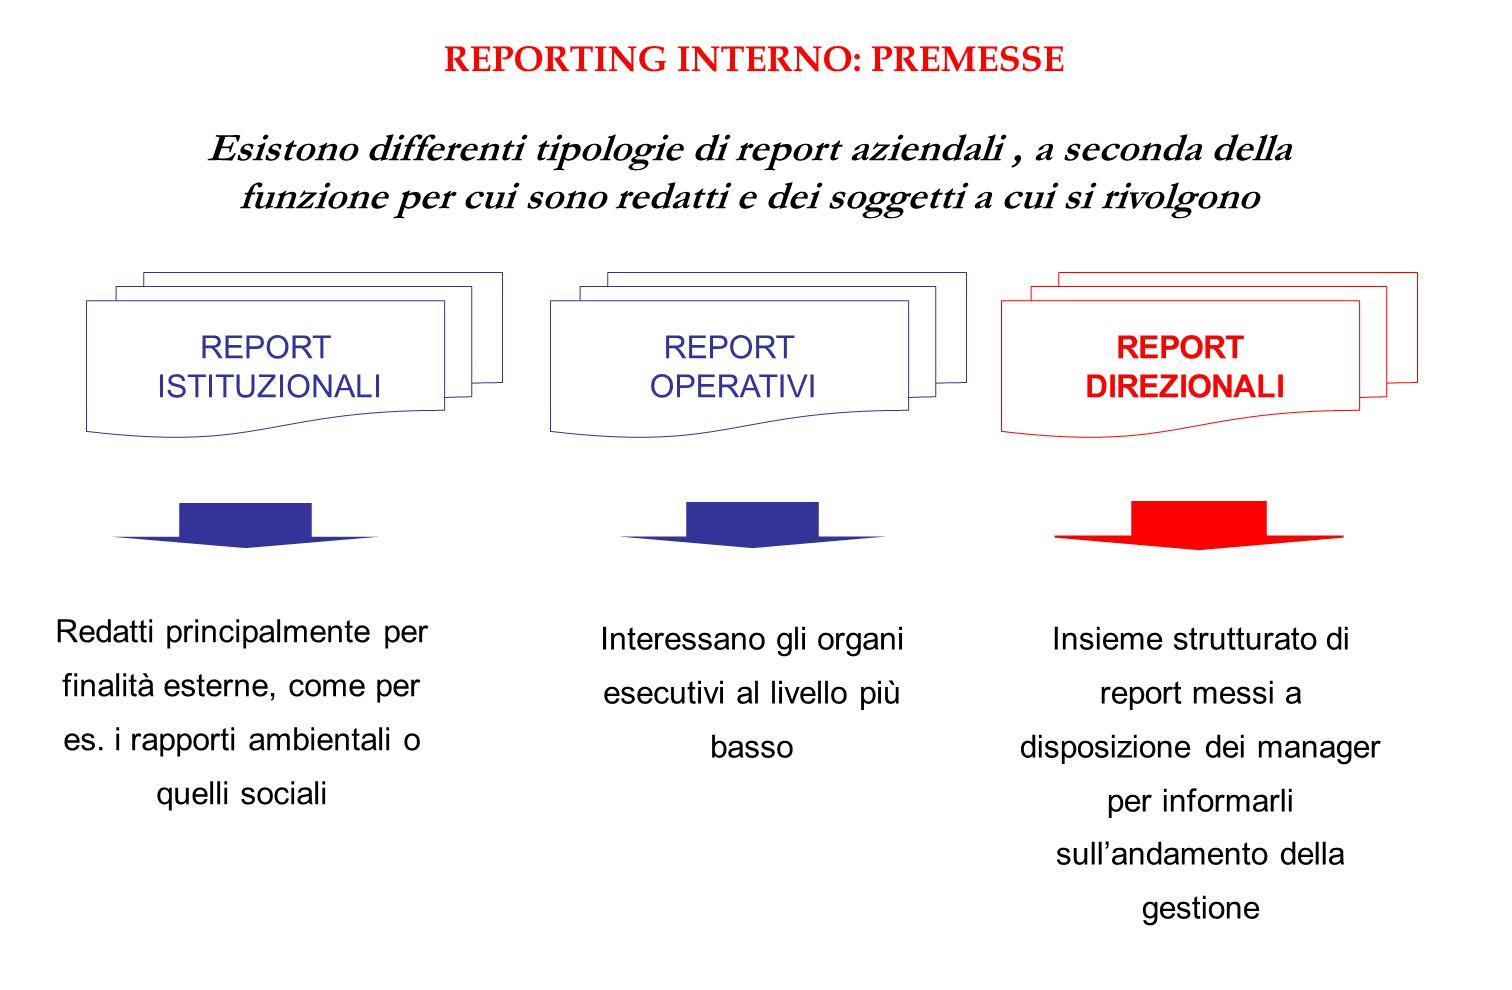 REPORTING INTERNO: PREMESSE